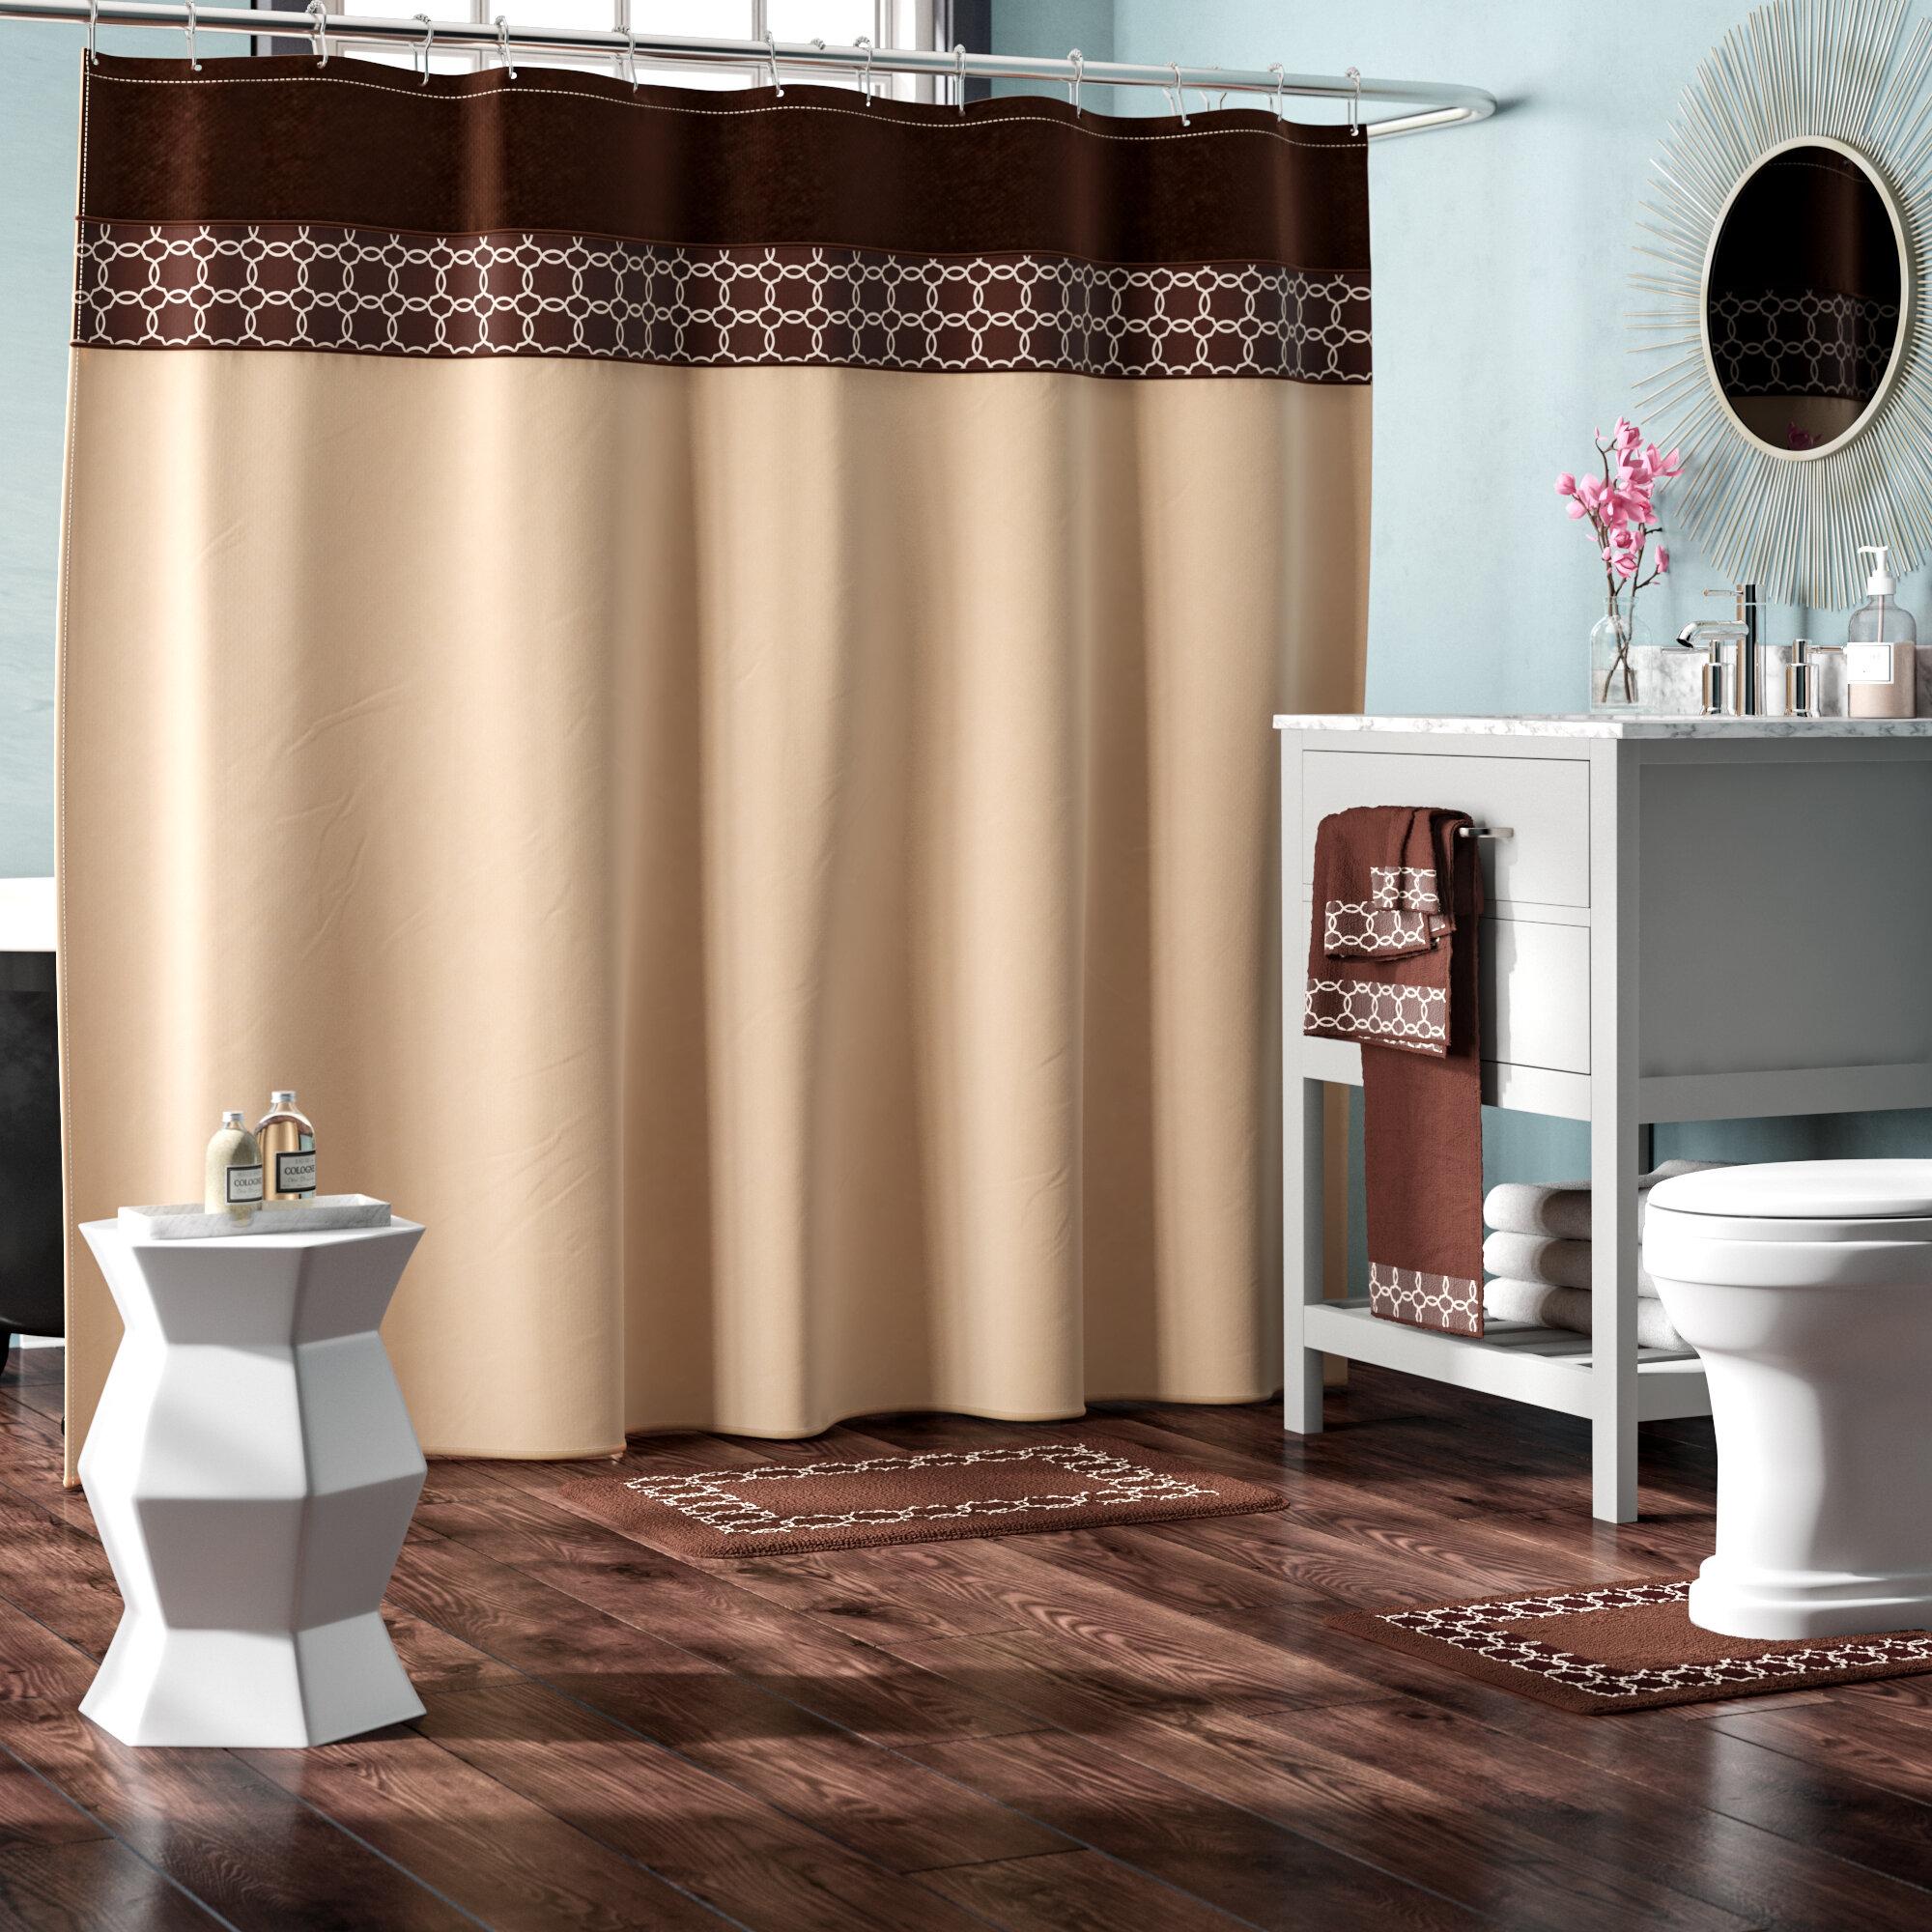 Willa Arlo Interiors Austyn 18 Piece Embroidery Shower Curtain Set ...